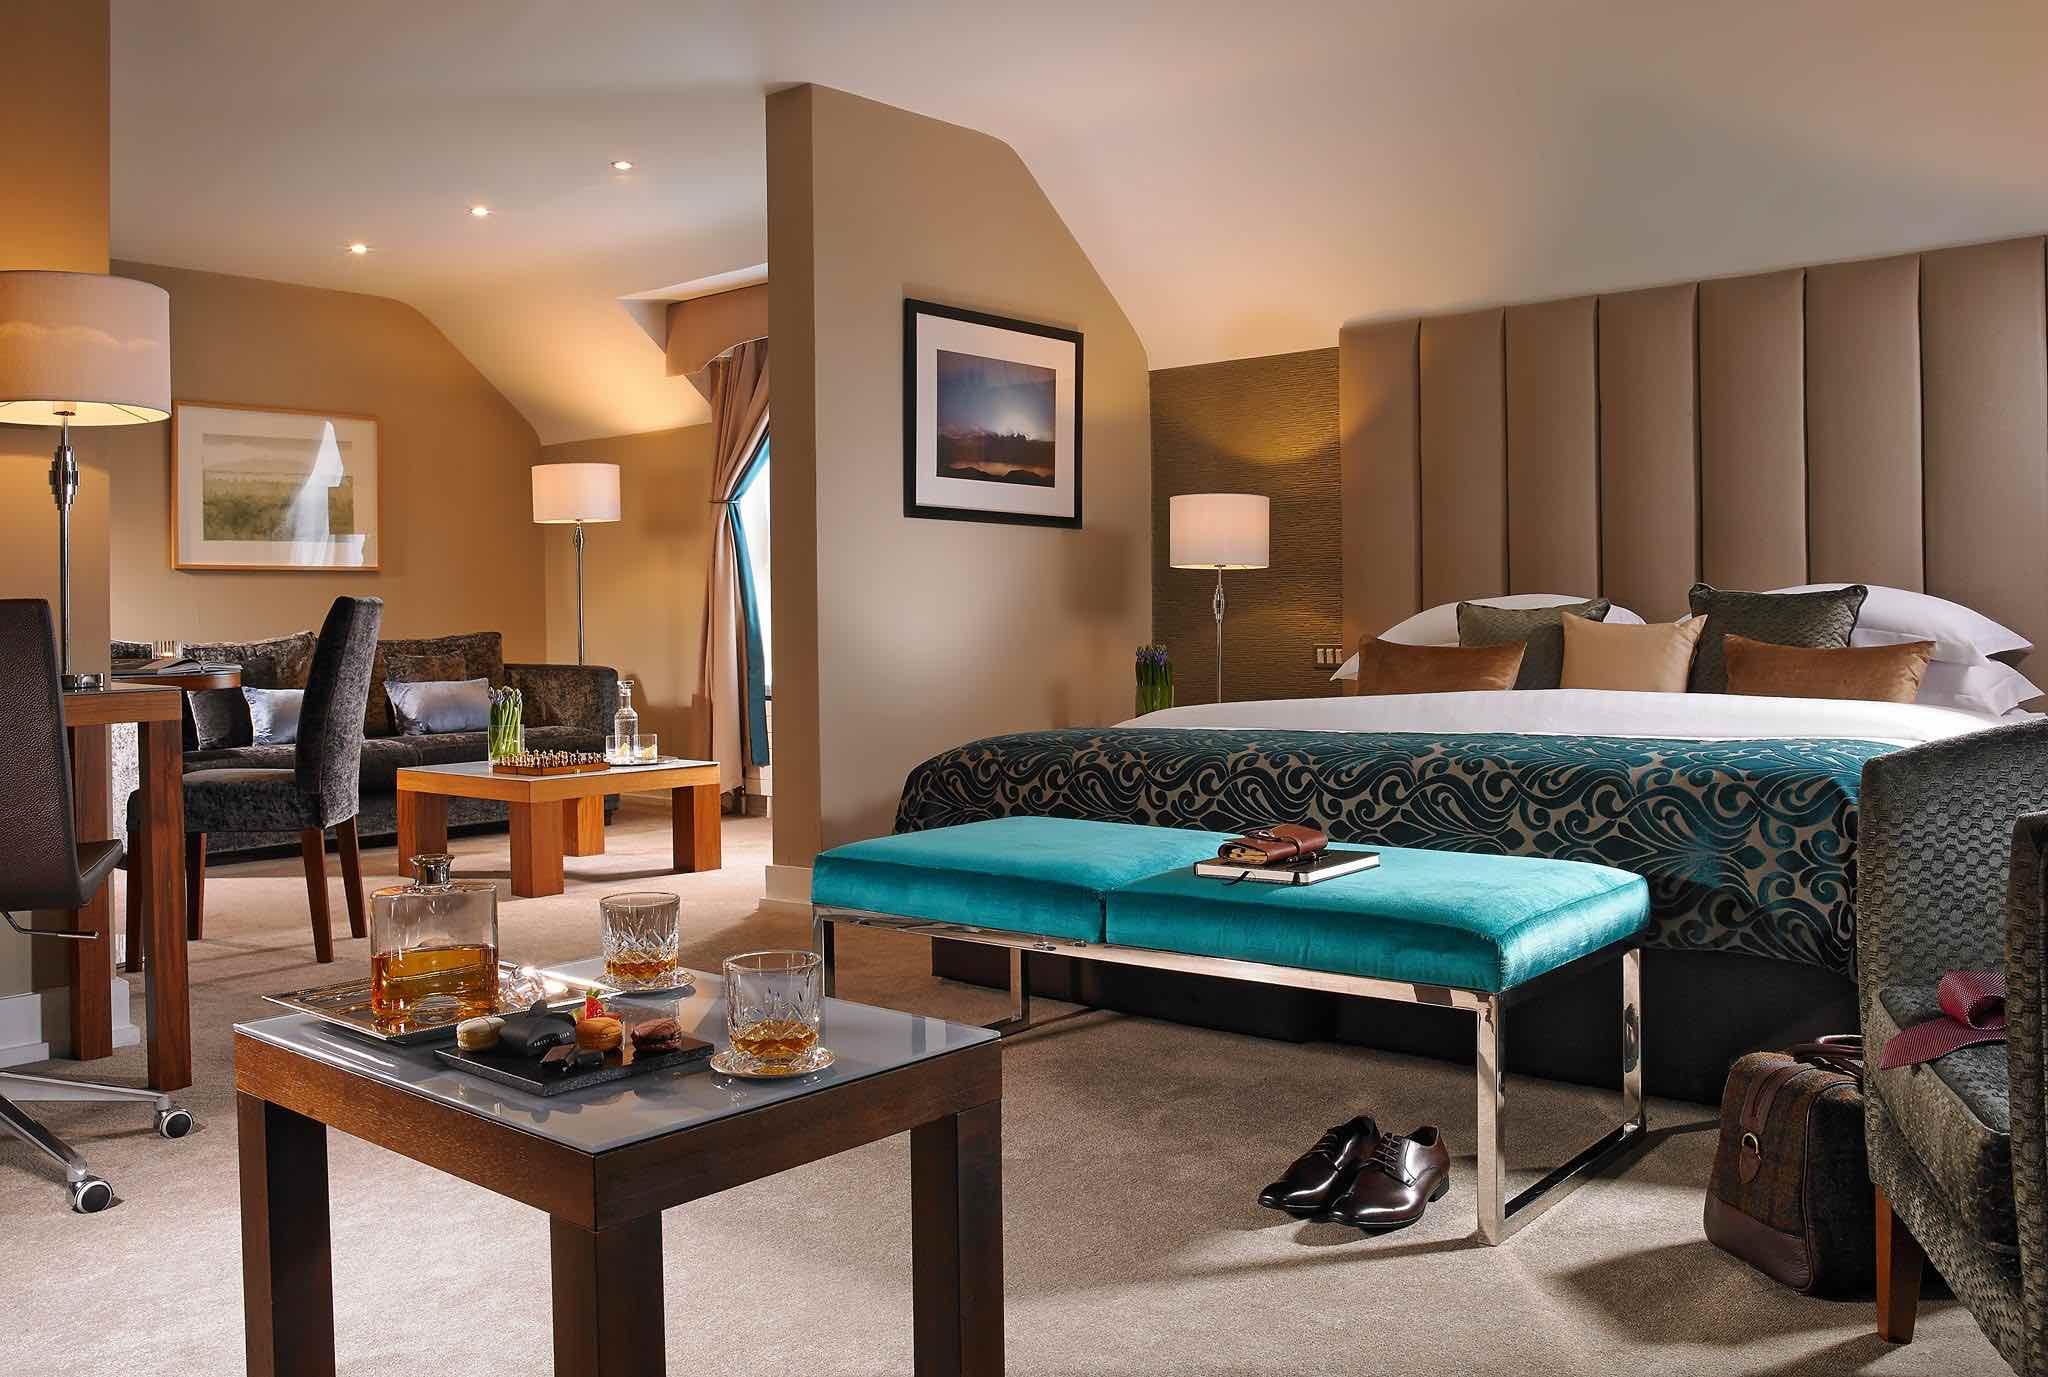 Castleknock Hotel luxury suite of luxury Dublin hotel spas interior